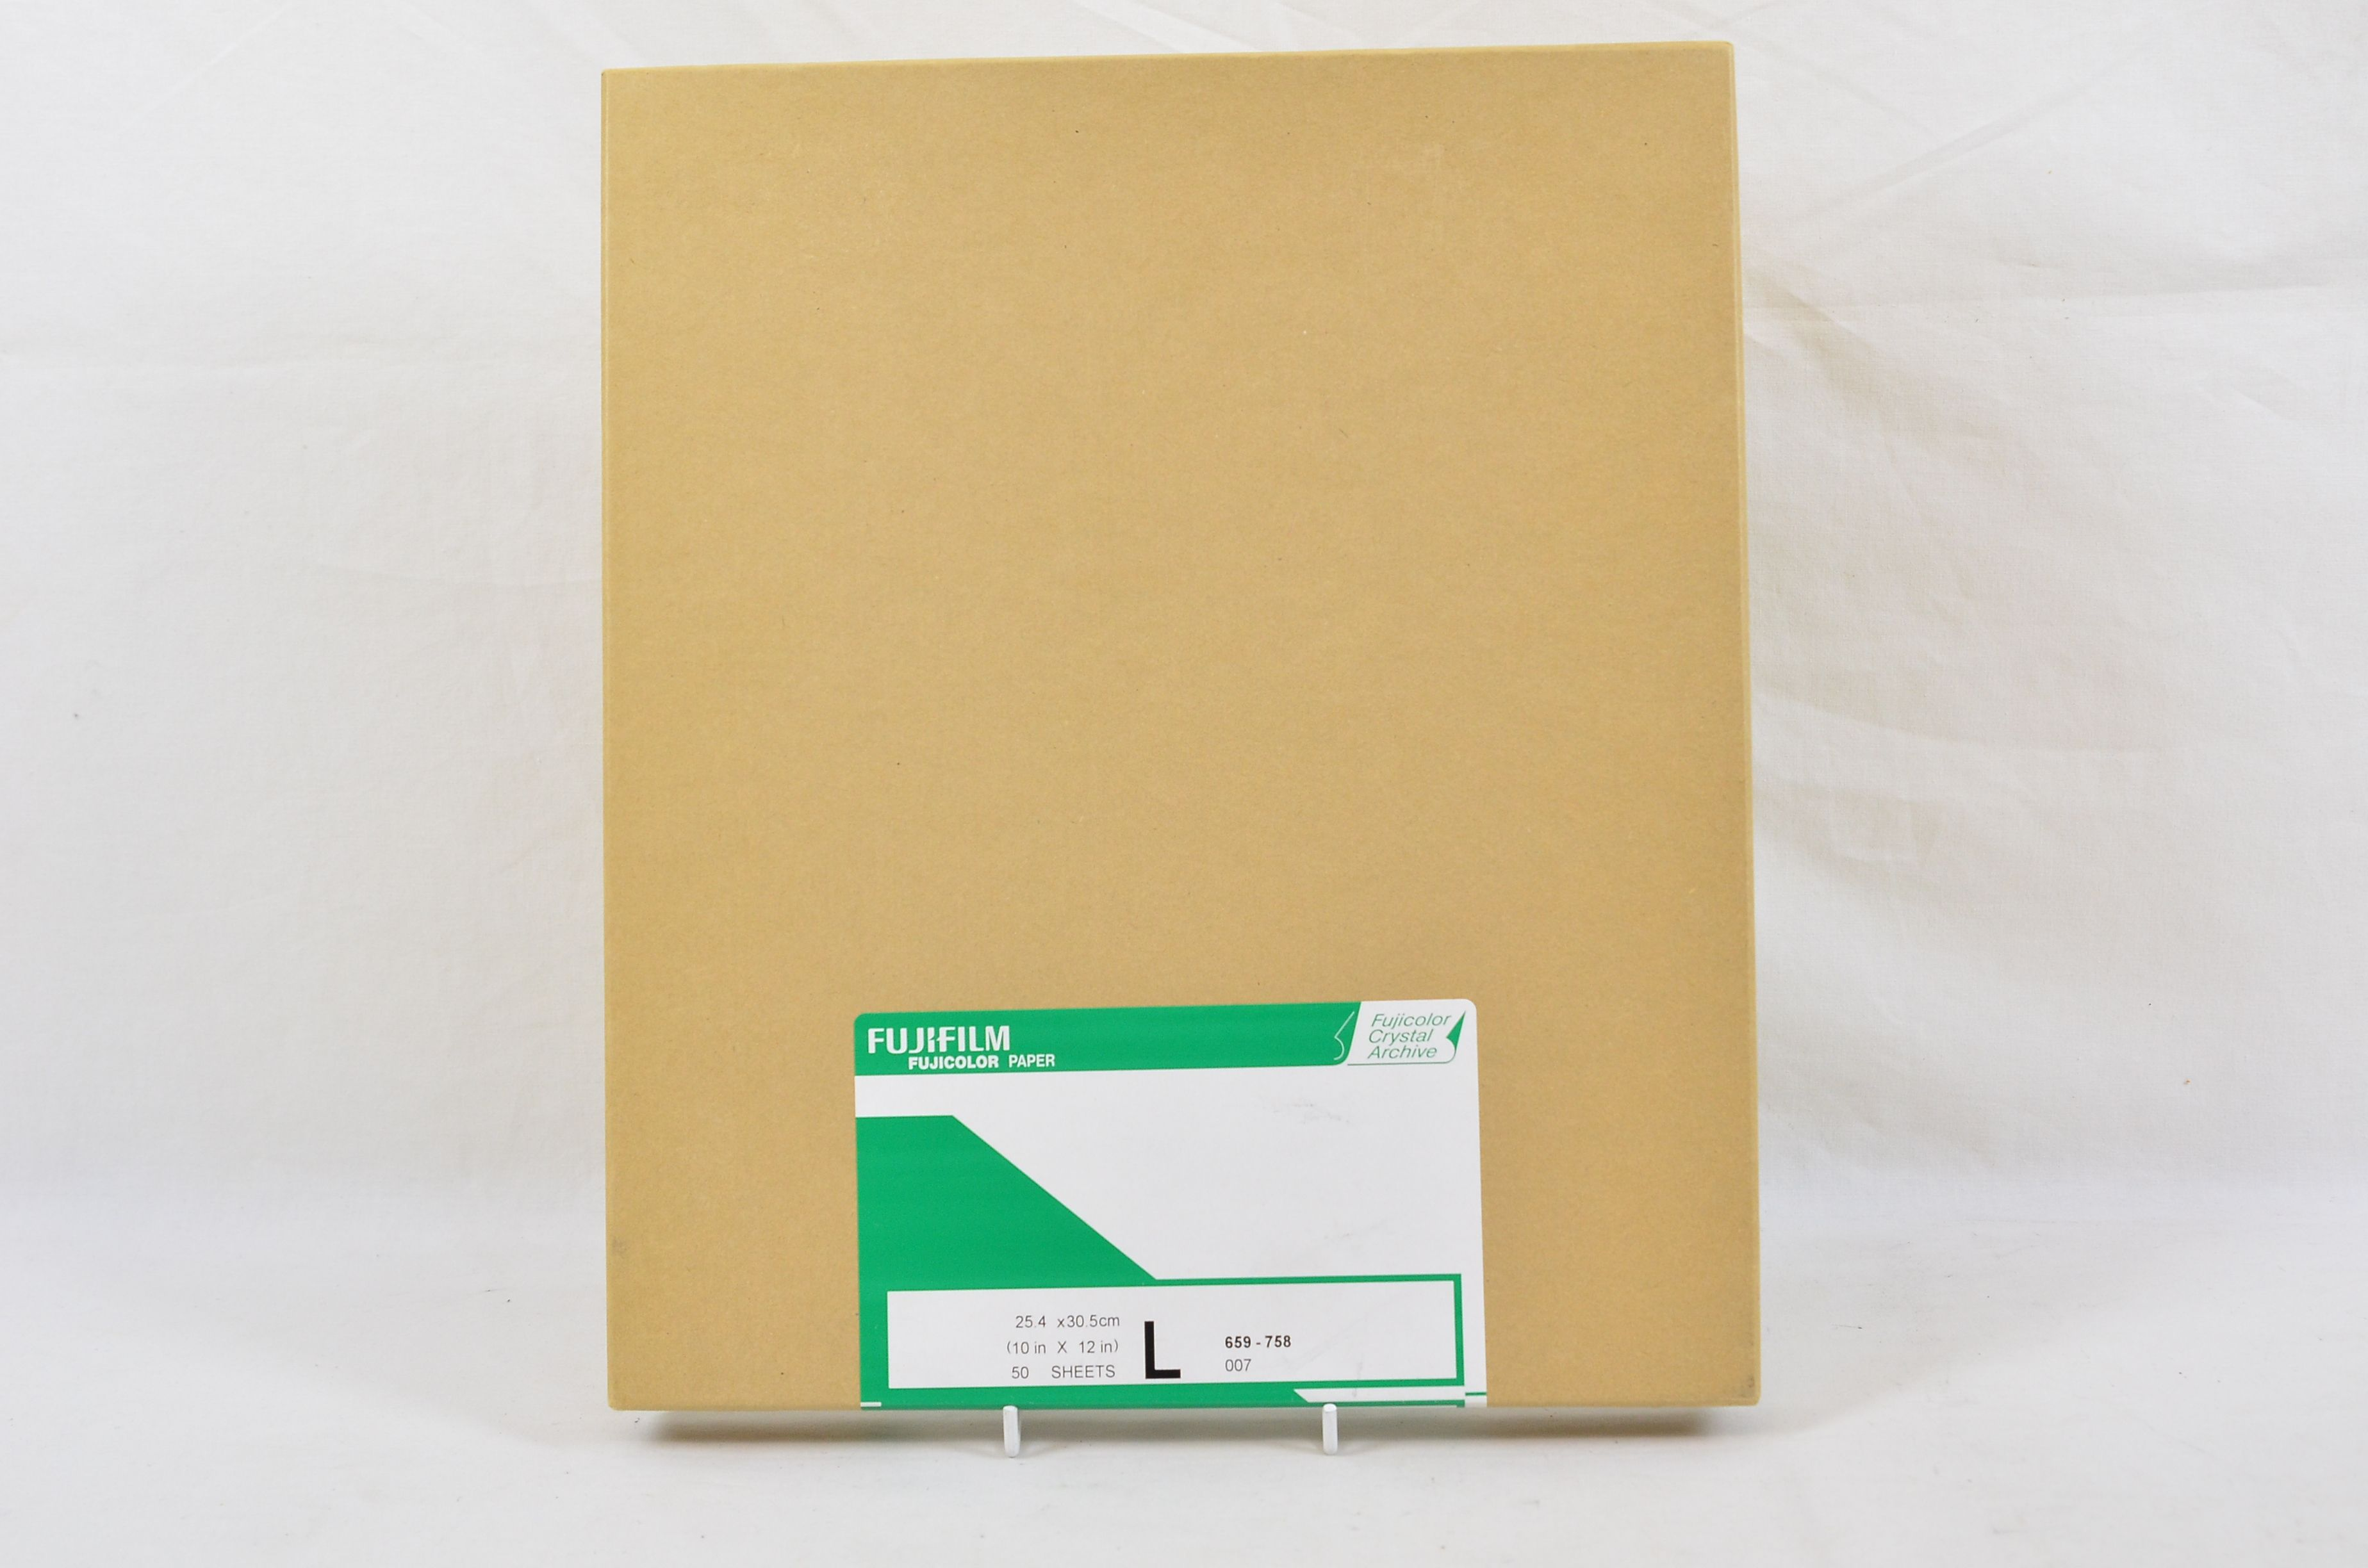 Fujifilm Fujicolor Crystal Archive Lustre Paper 25.4x30.5cm 10x12in - 50 Sheets Thumbnail 1